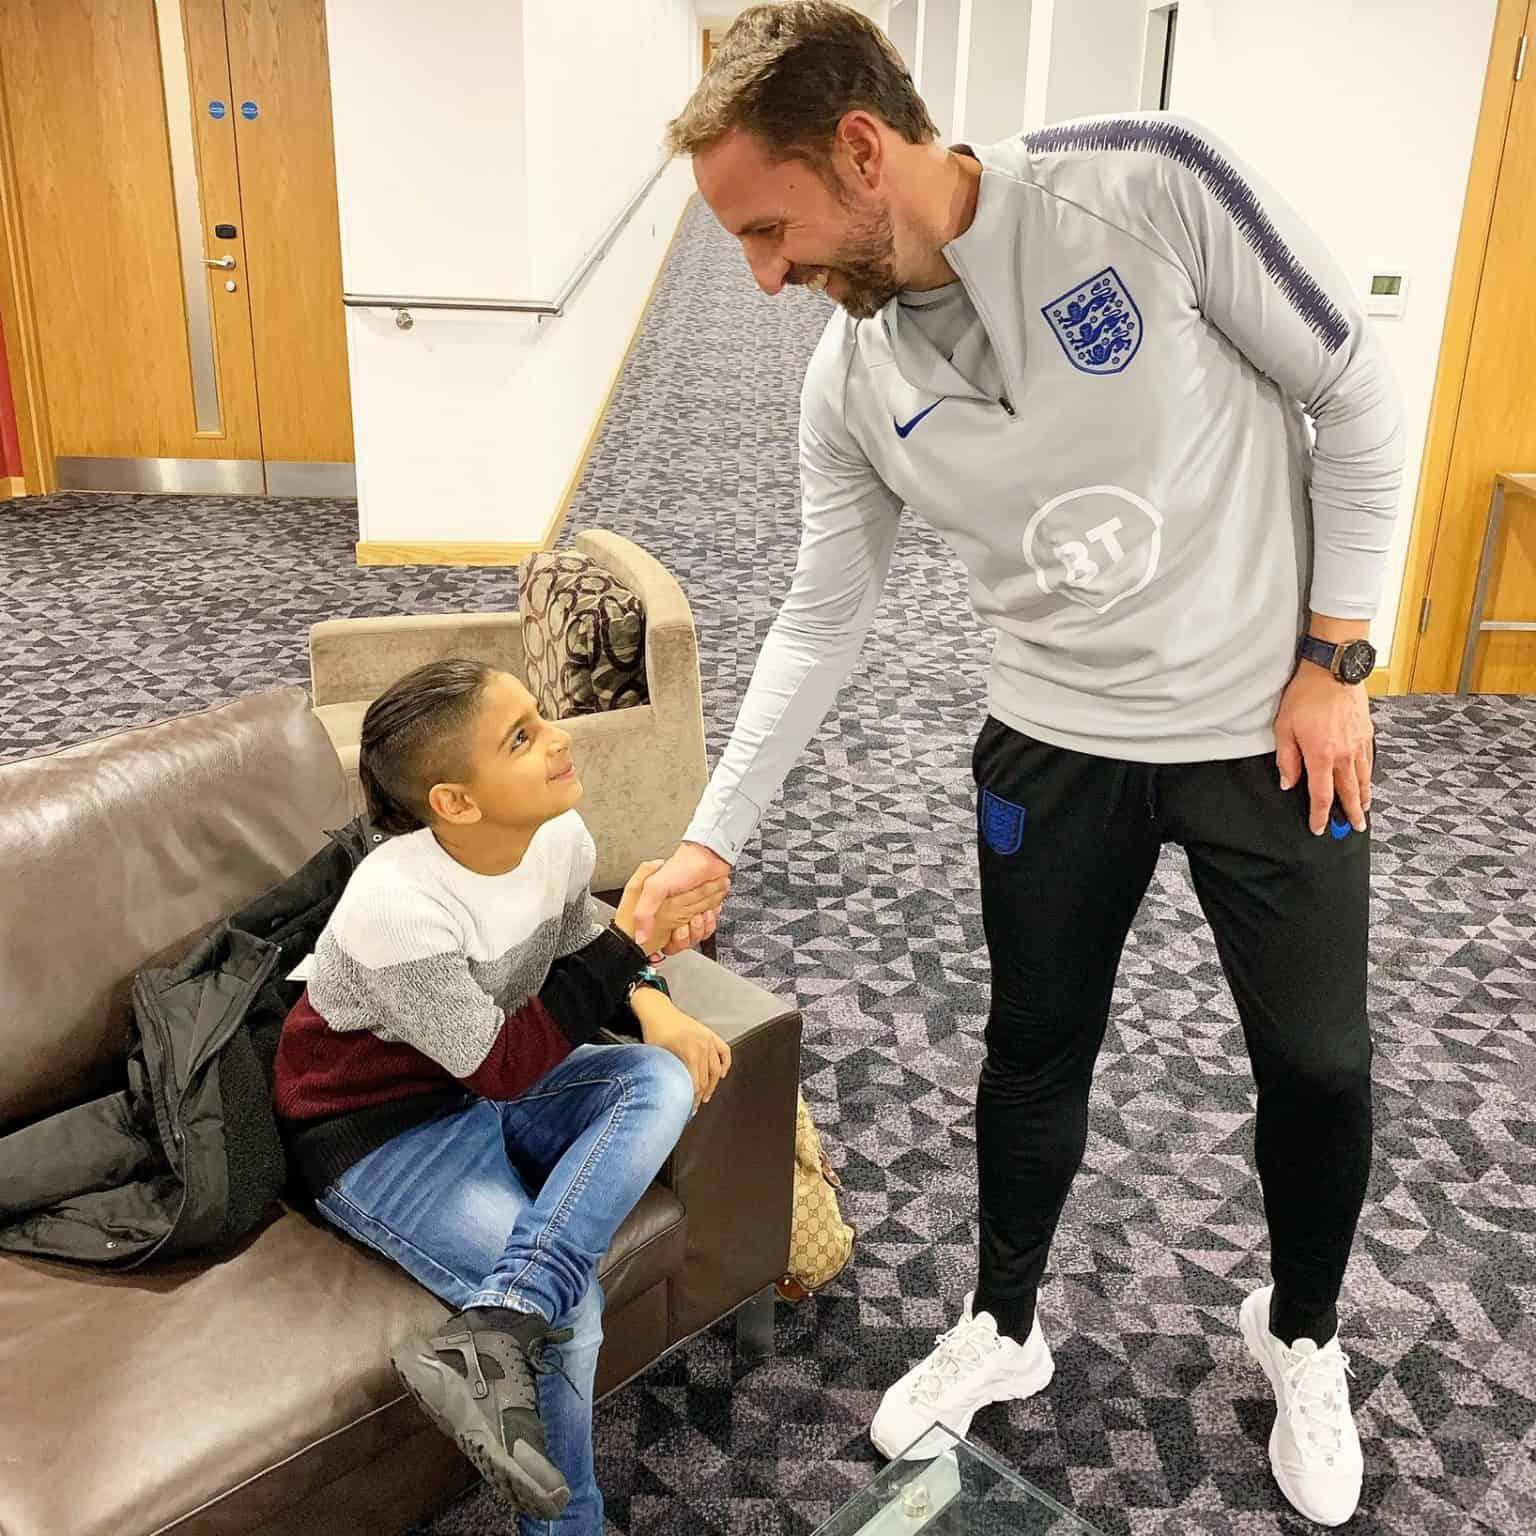 Mikey Poulli meeting England boss Gareth Southgate